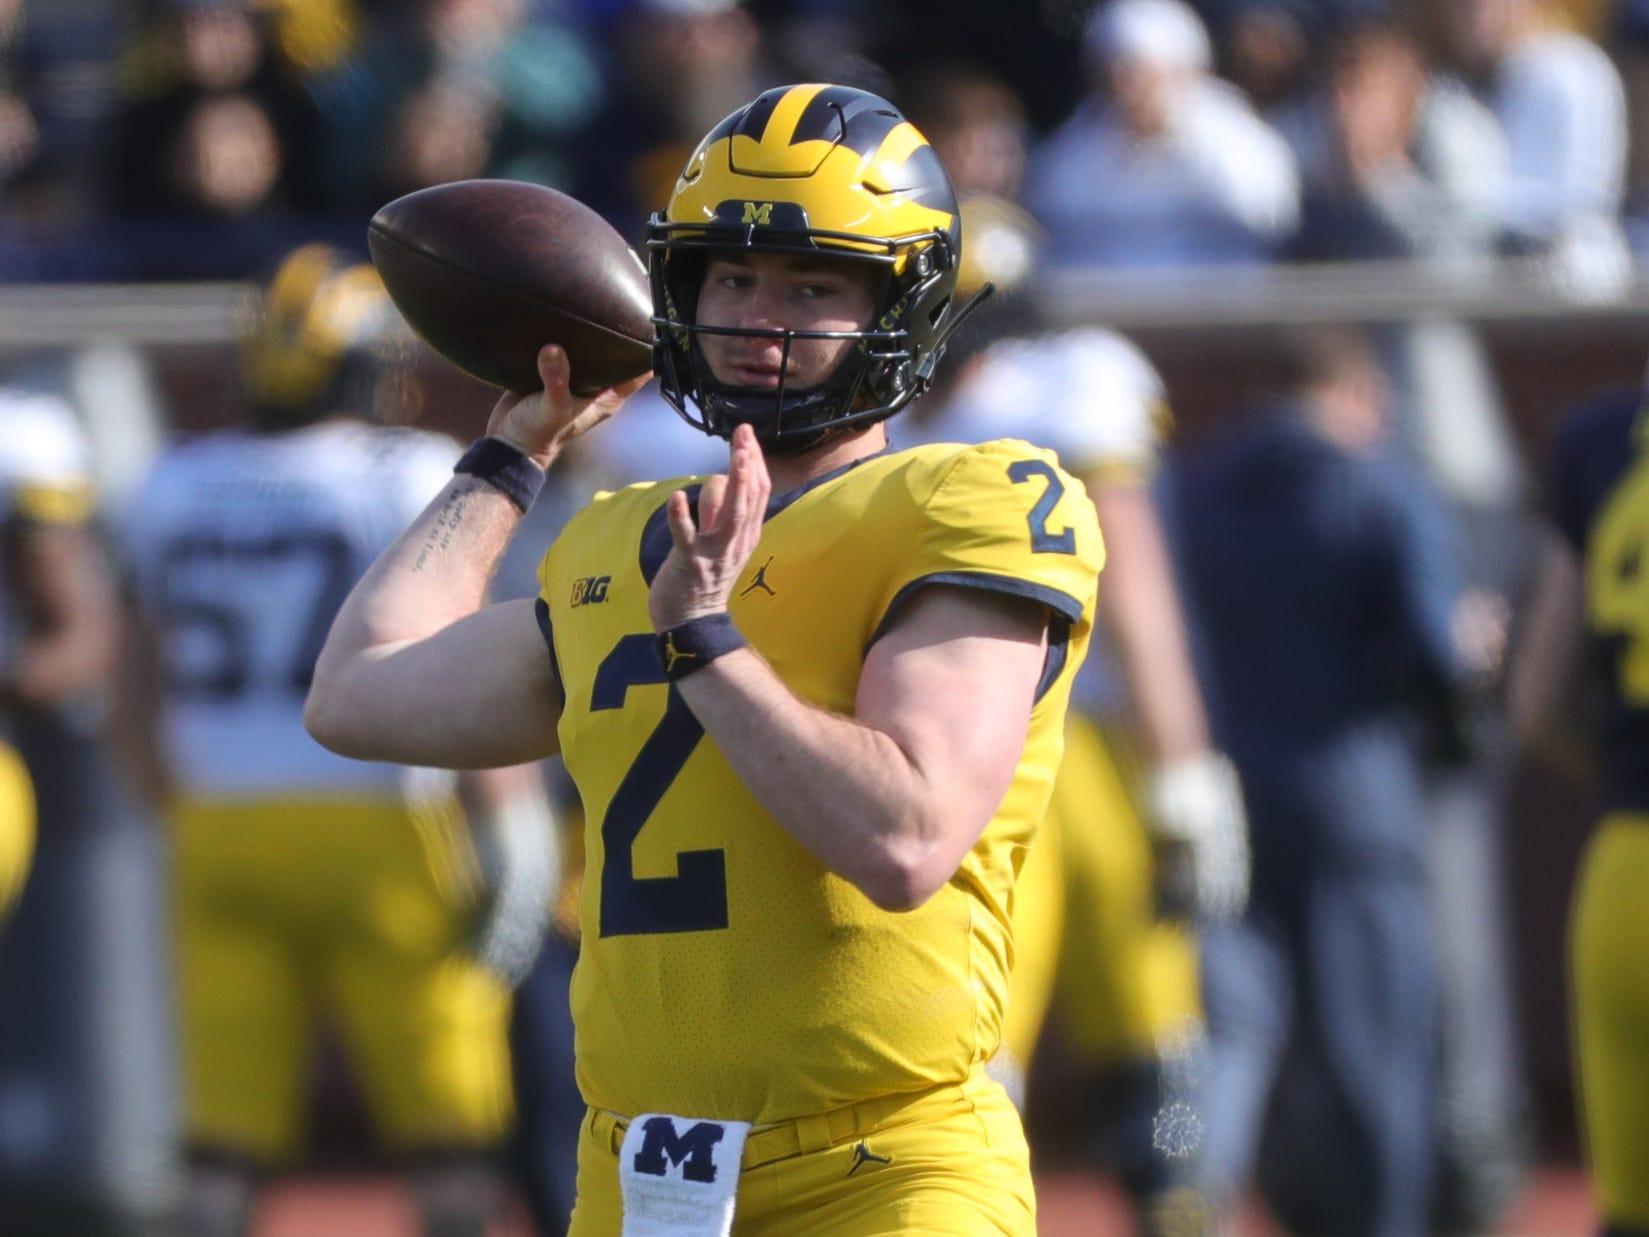 Michigan quarterback Shea Patterson passes during the spring game Saturday, April 13, 2019 at Michigan Stadium in Ann Arbor.